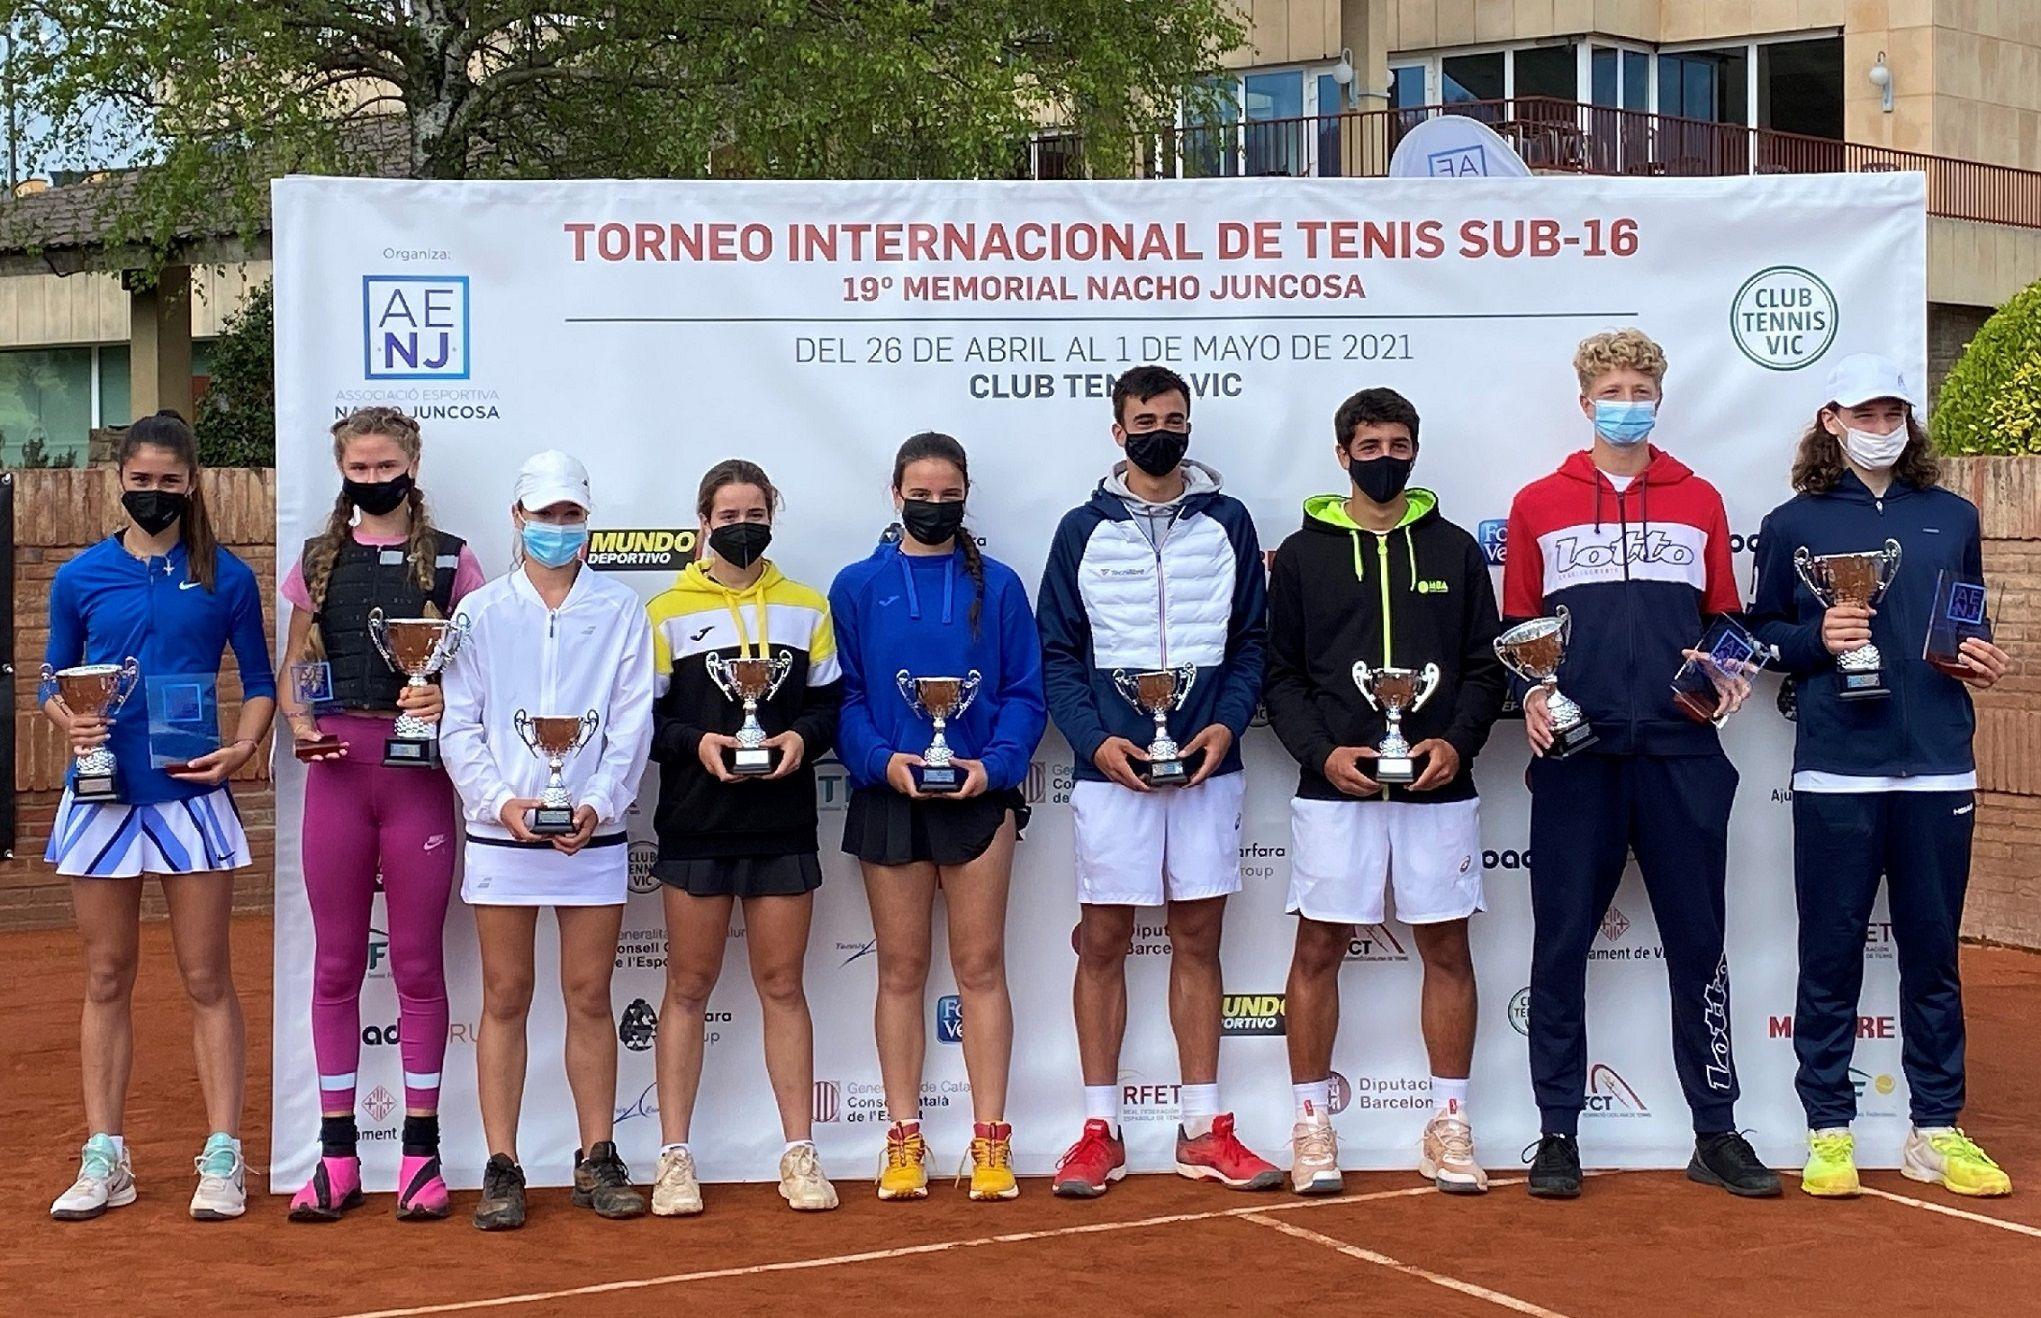 Vera Sokolova y Tomasz Berkieta ganadores del torneo internacional de tenis, 19º Memorial Nacho Juncosa